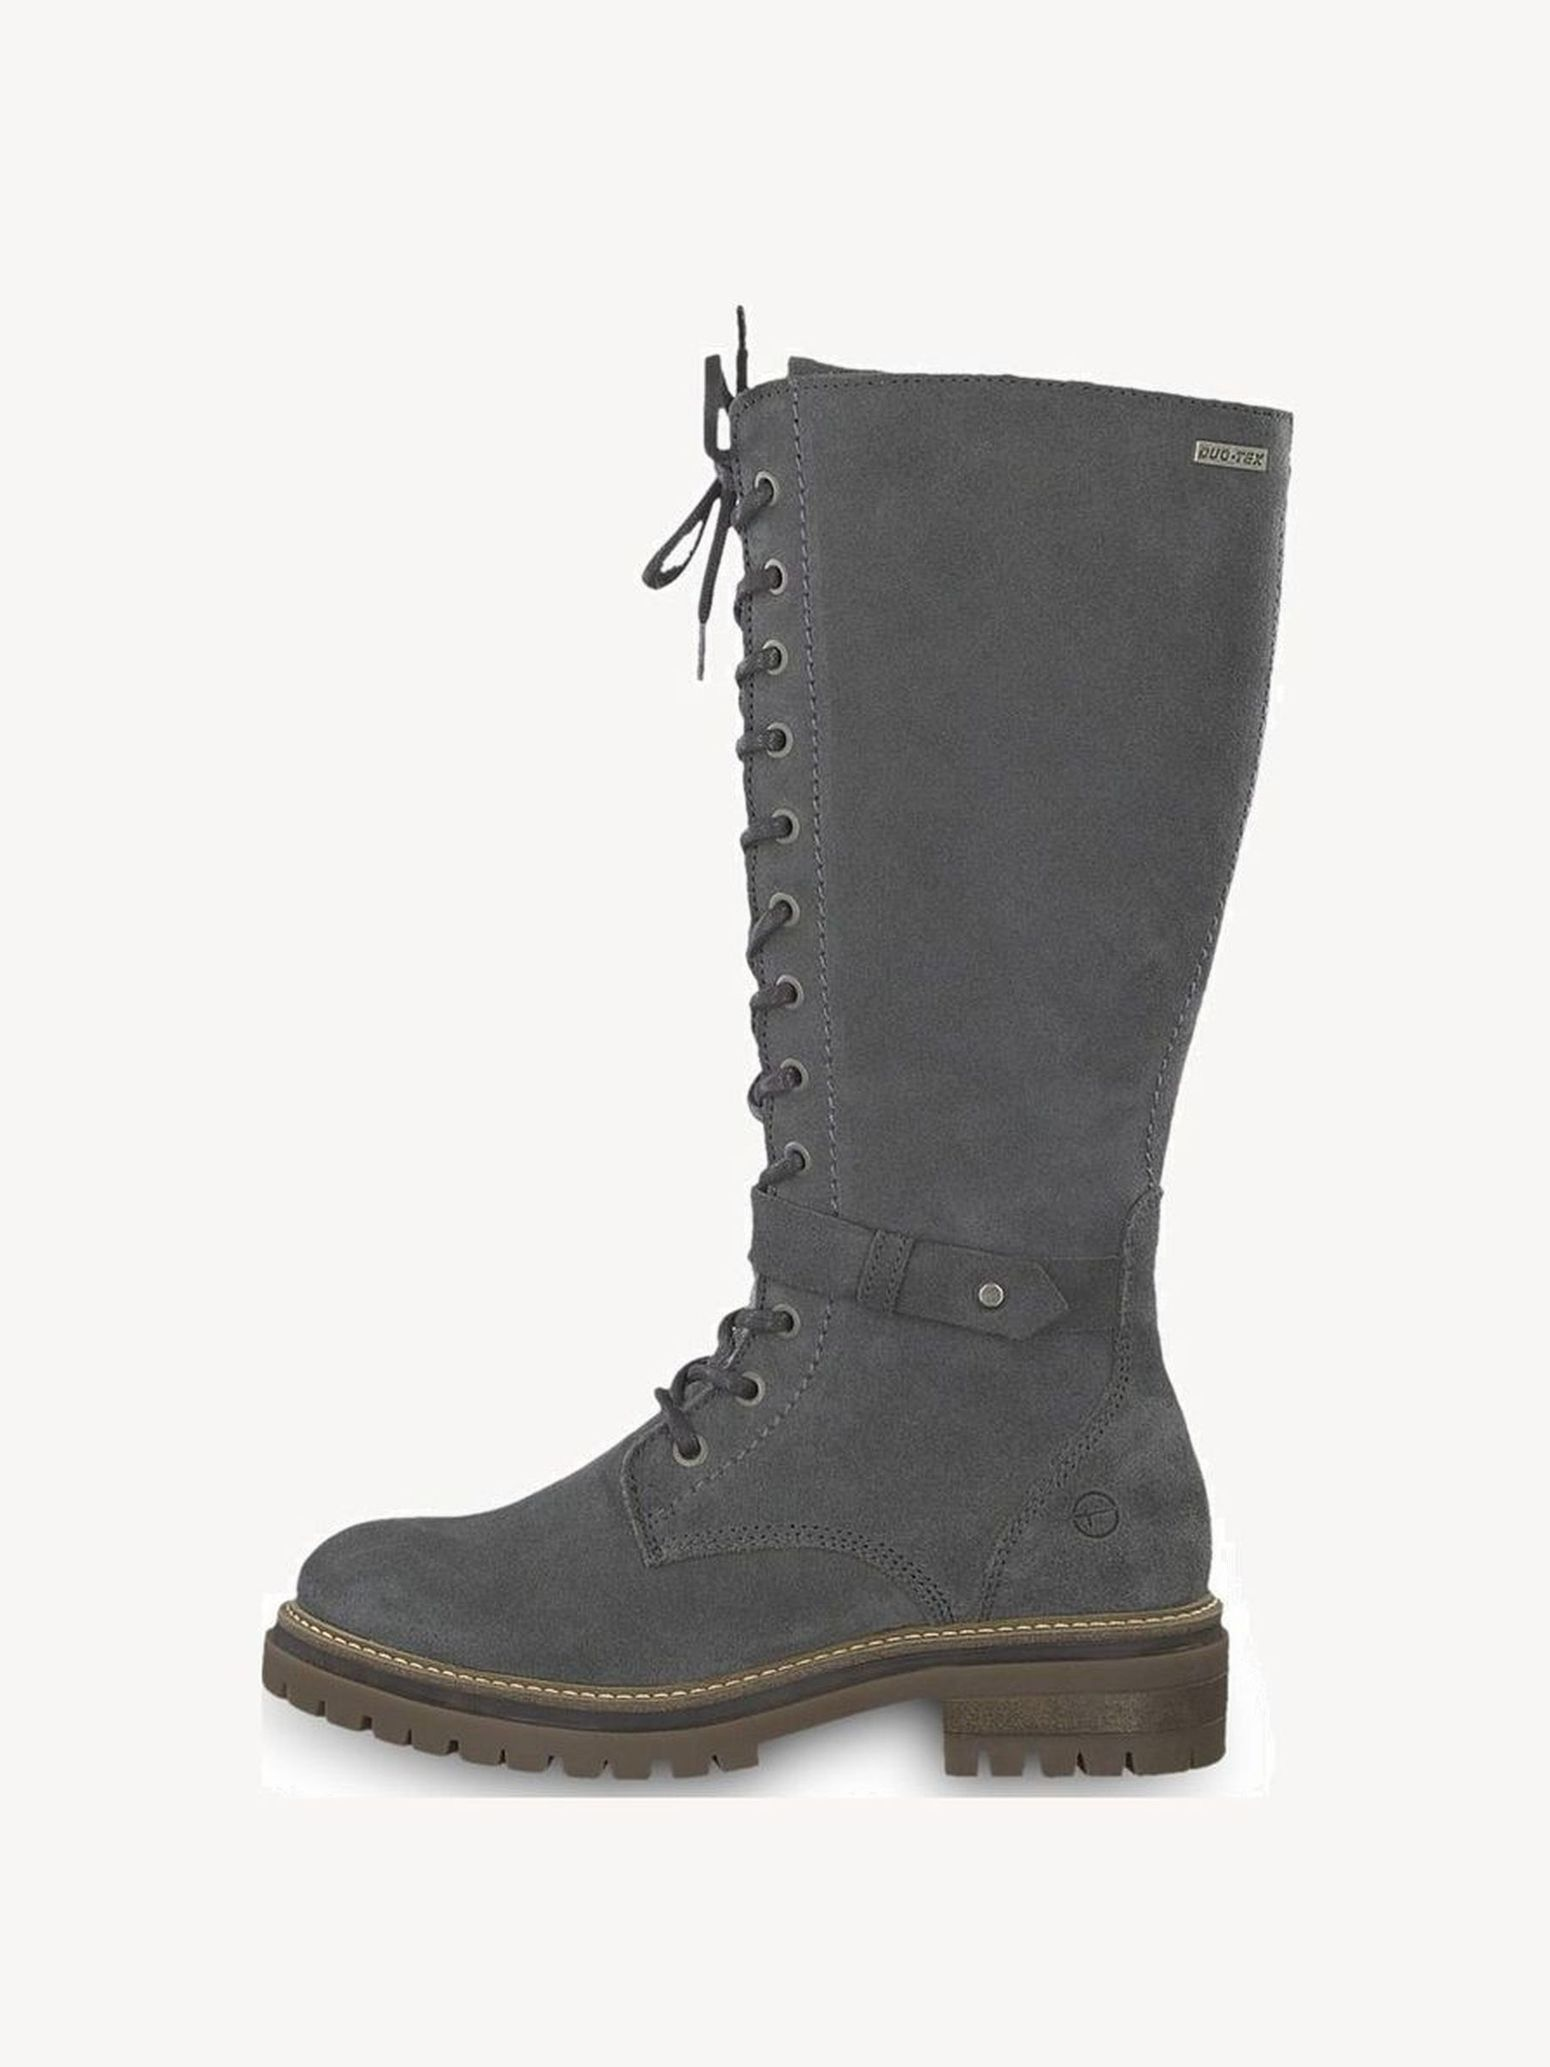 Tamaris Snow Boots grey brown leather